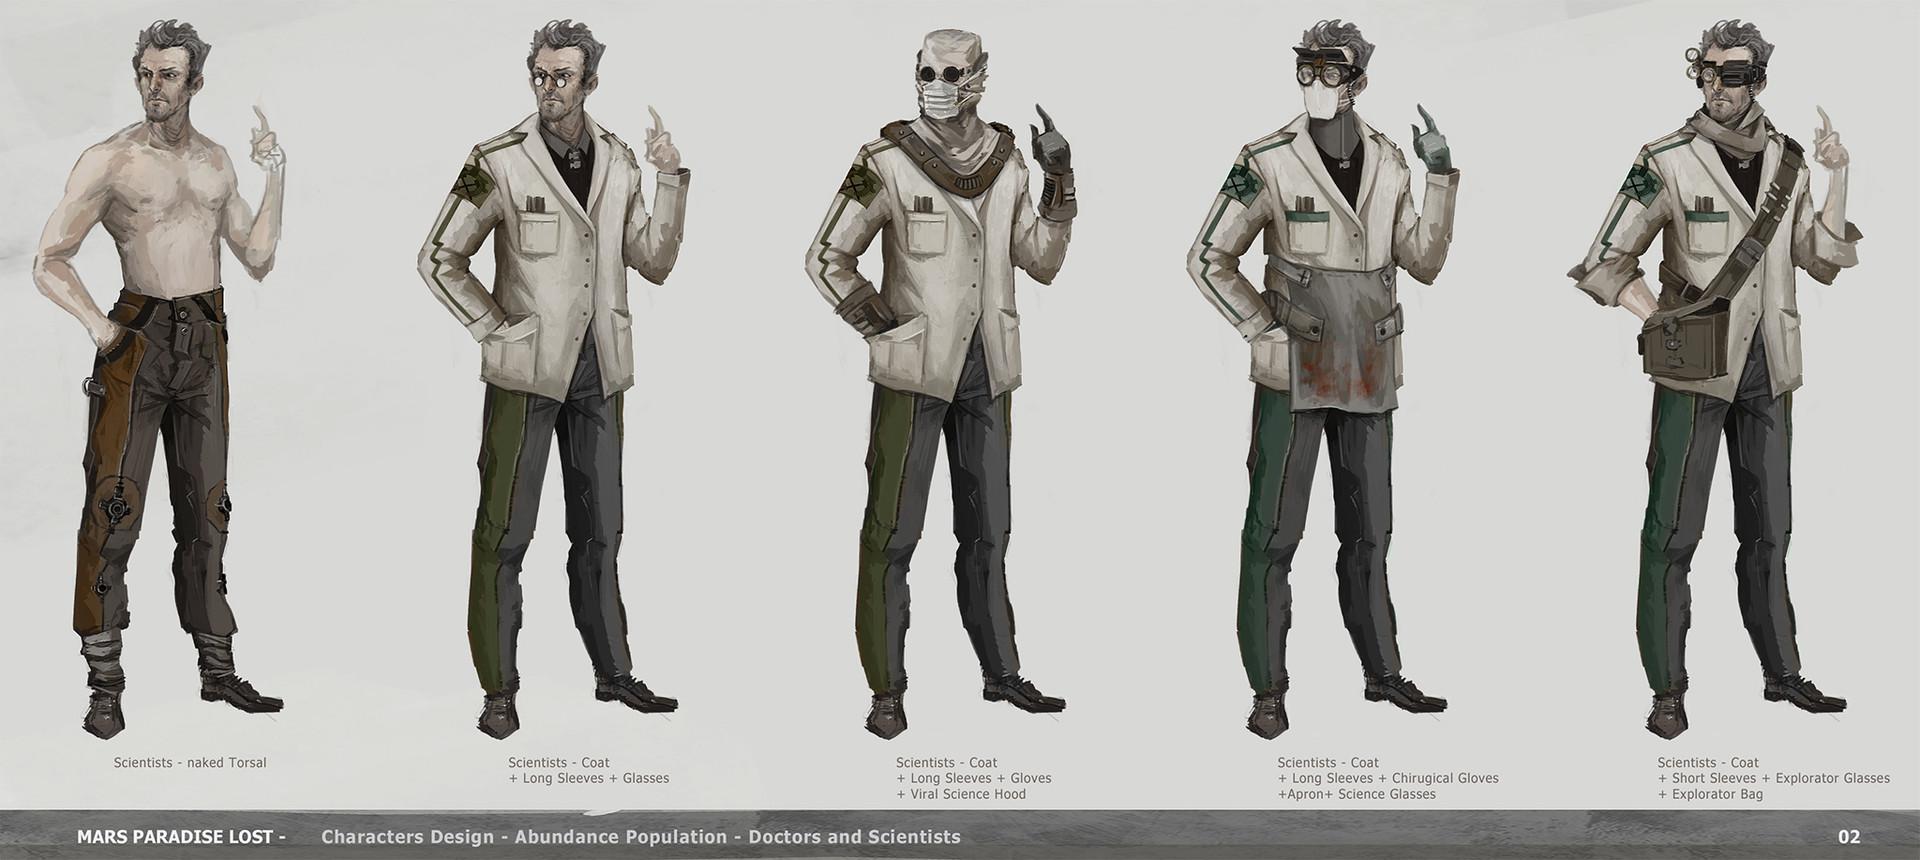 Alexandre chaudret mpl characters abondance population scientists02